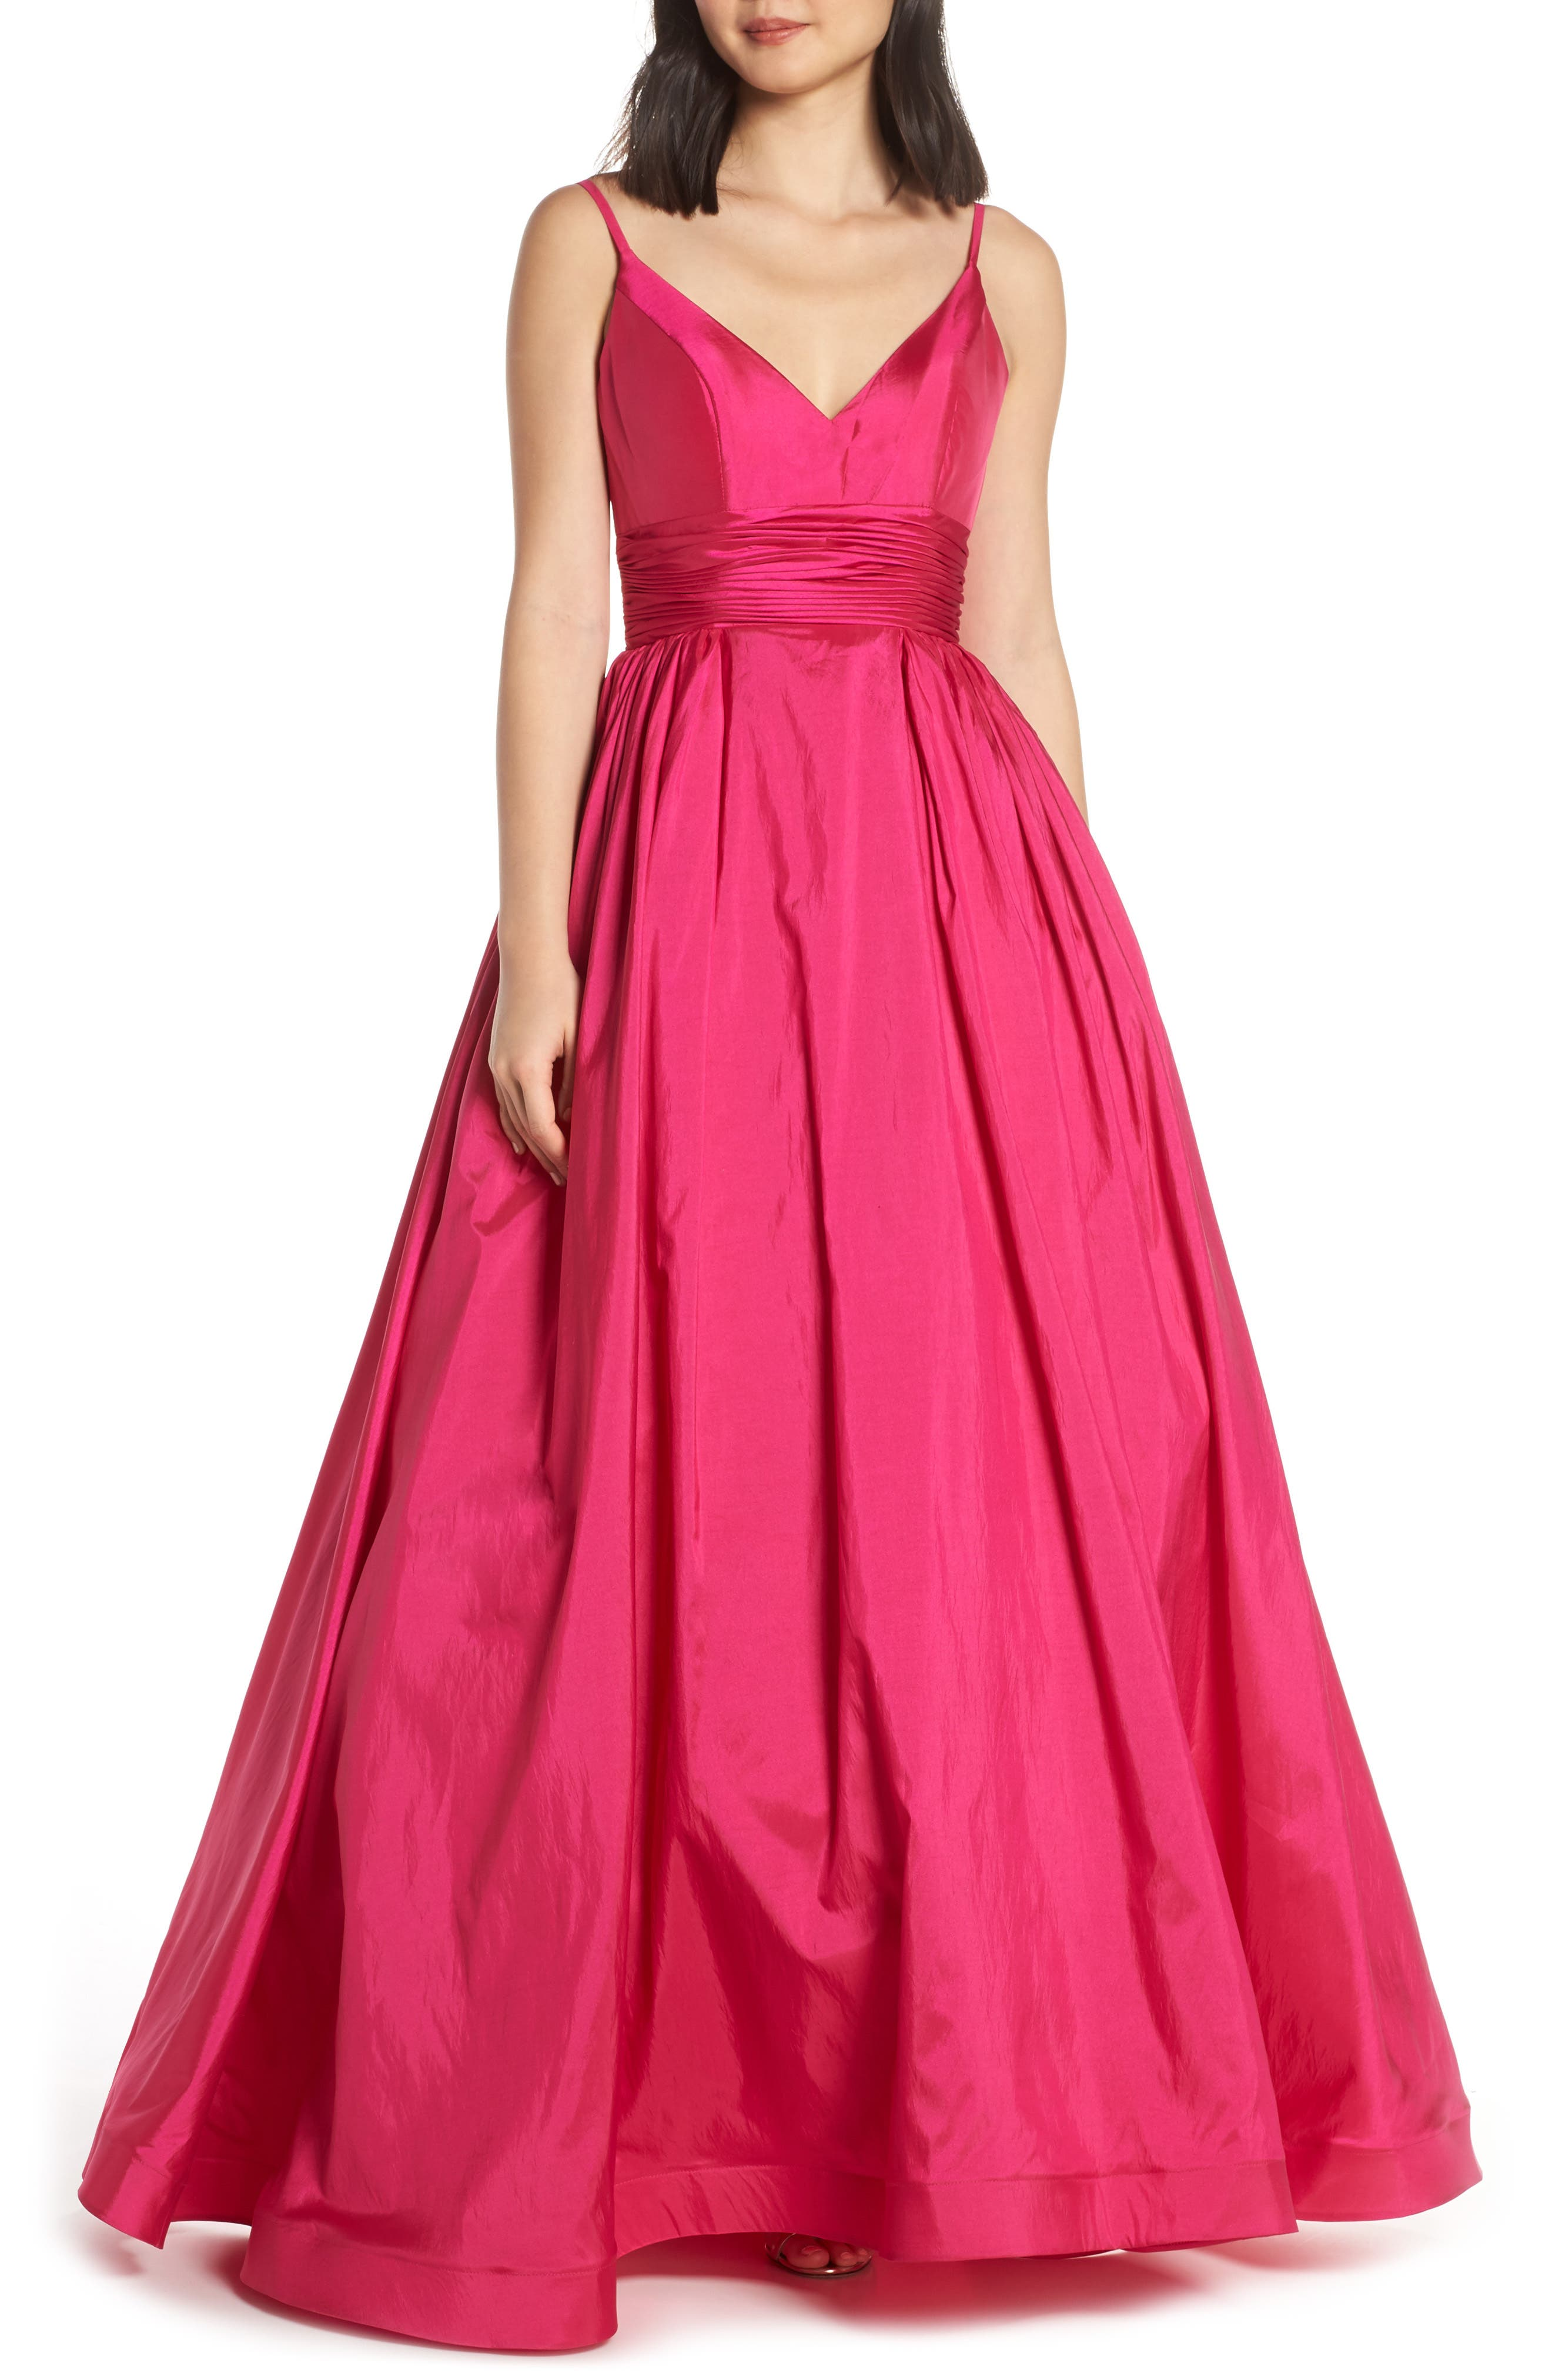 MAC DUGGAL, V-Neck Satin Evening Dress, Main thumbnail 1, color, MAGENTA